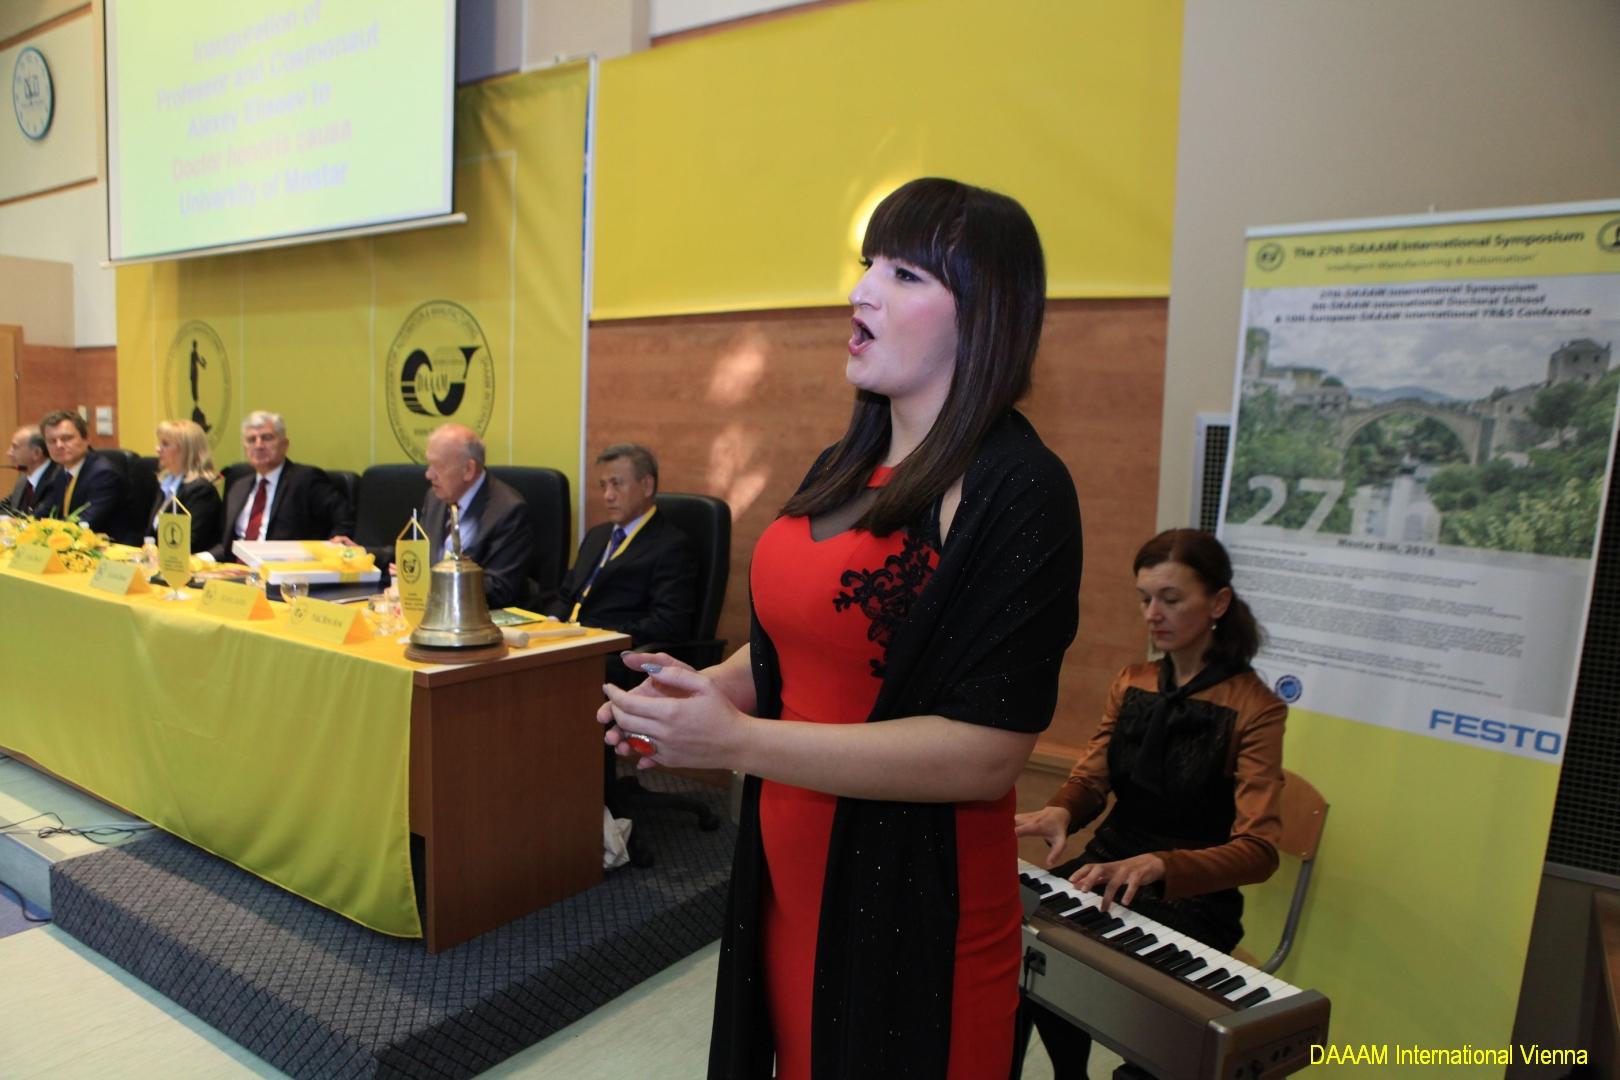 DAAAM_2016_Mostar_06_Professor_and_Cosmonaut_Alexey_Eliseev_Doctor_honors_causa_033